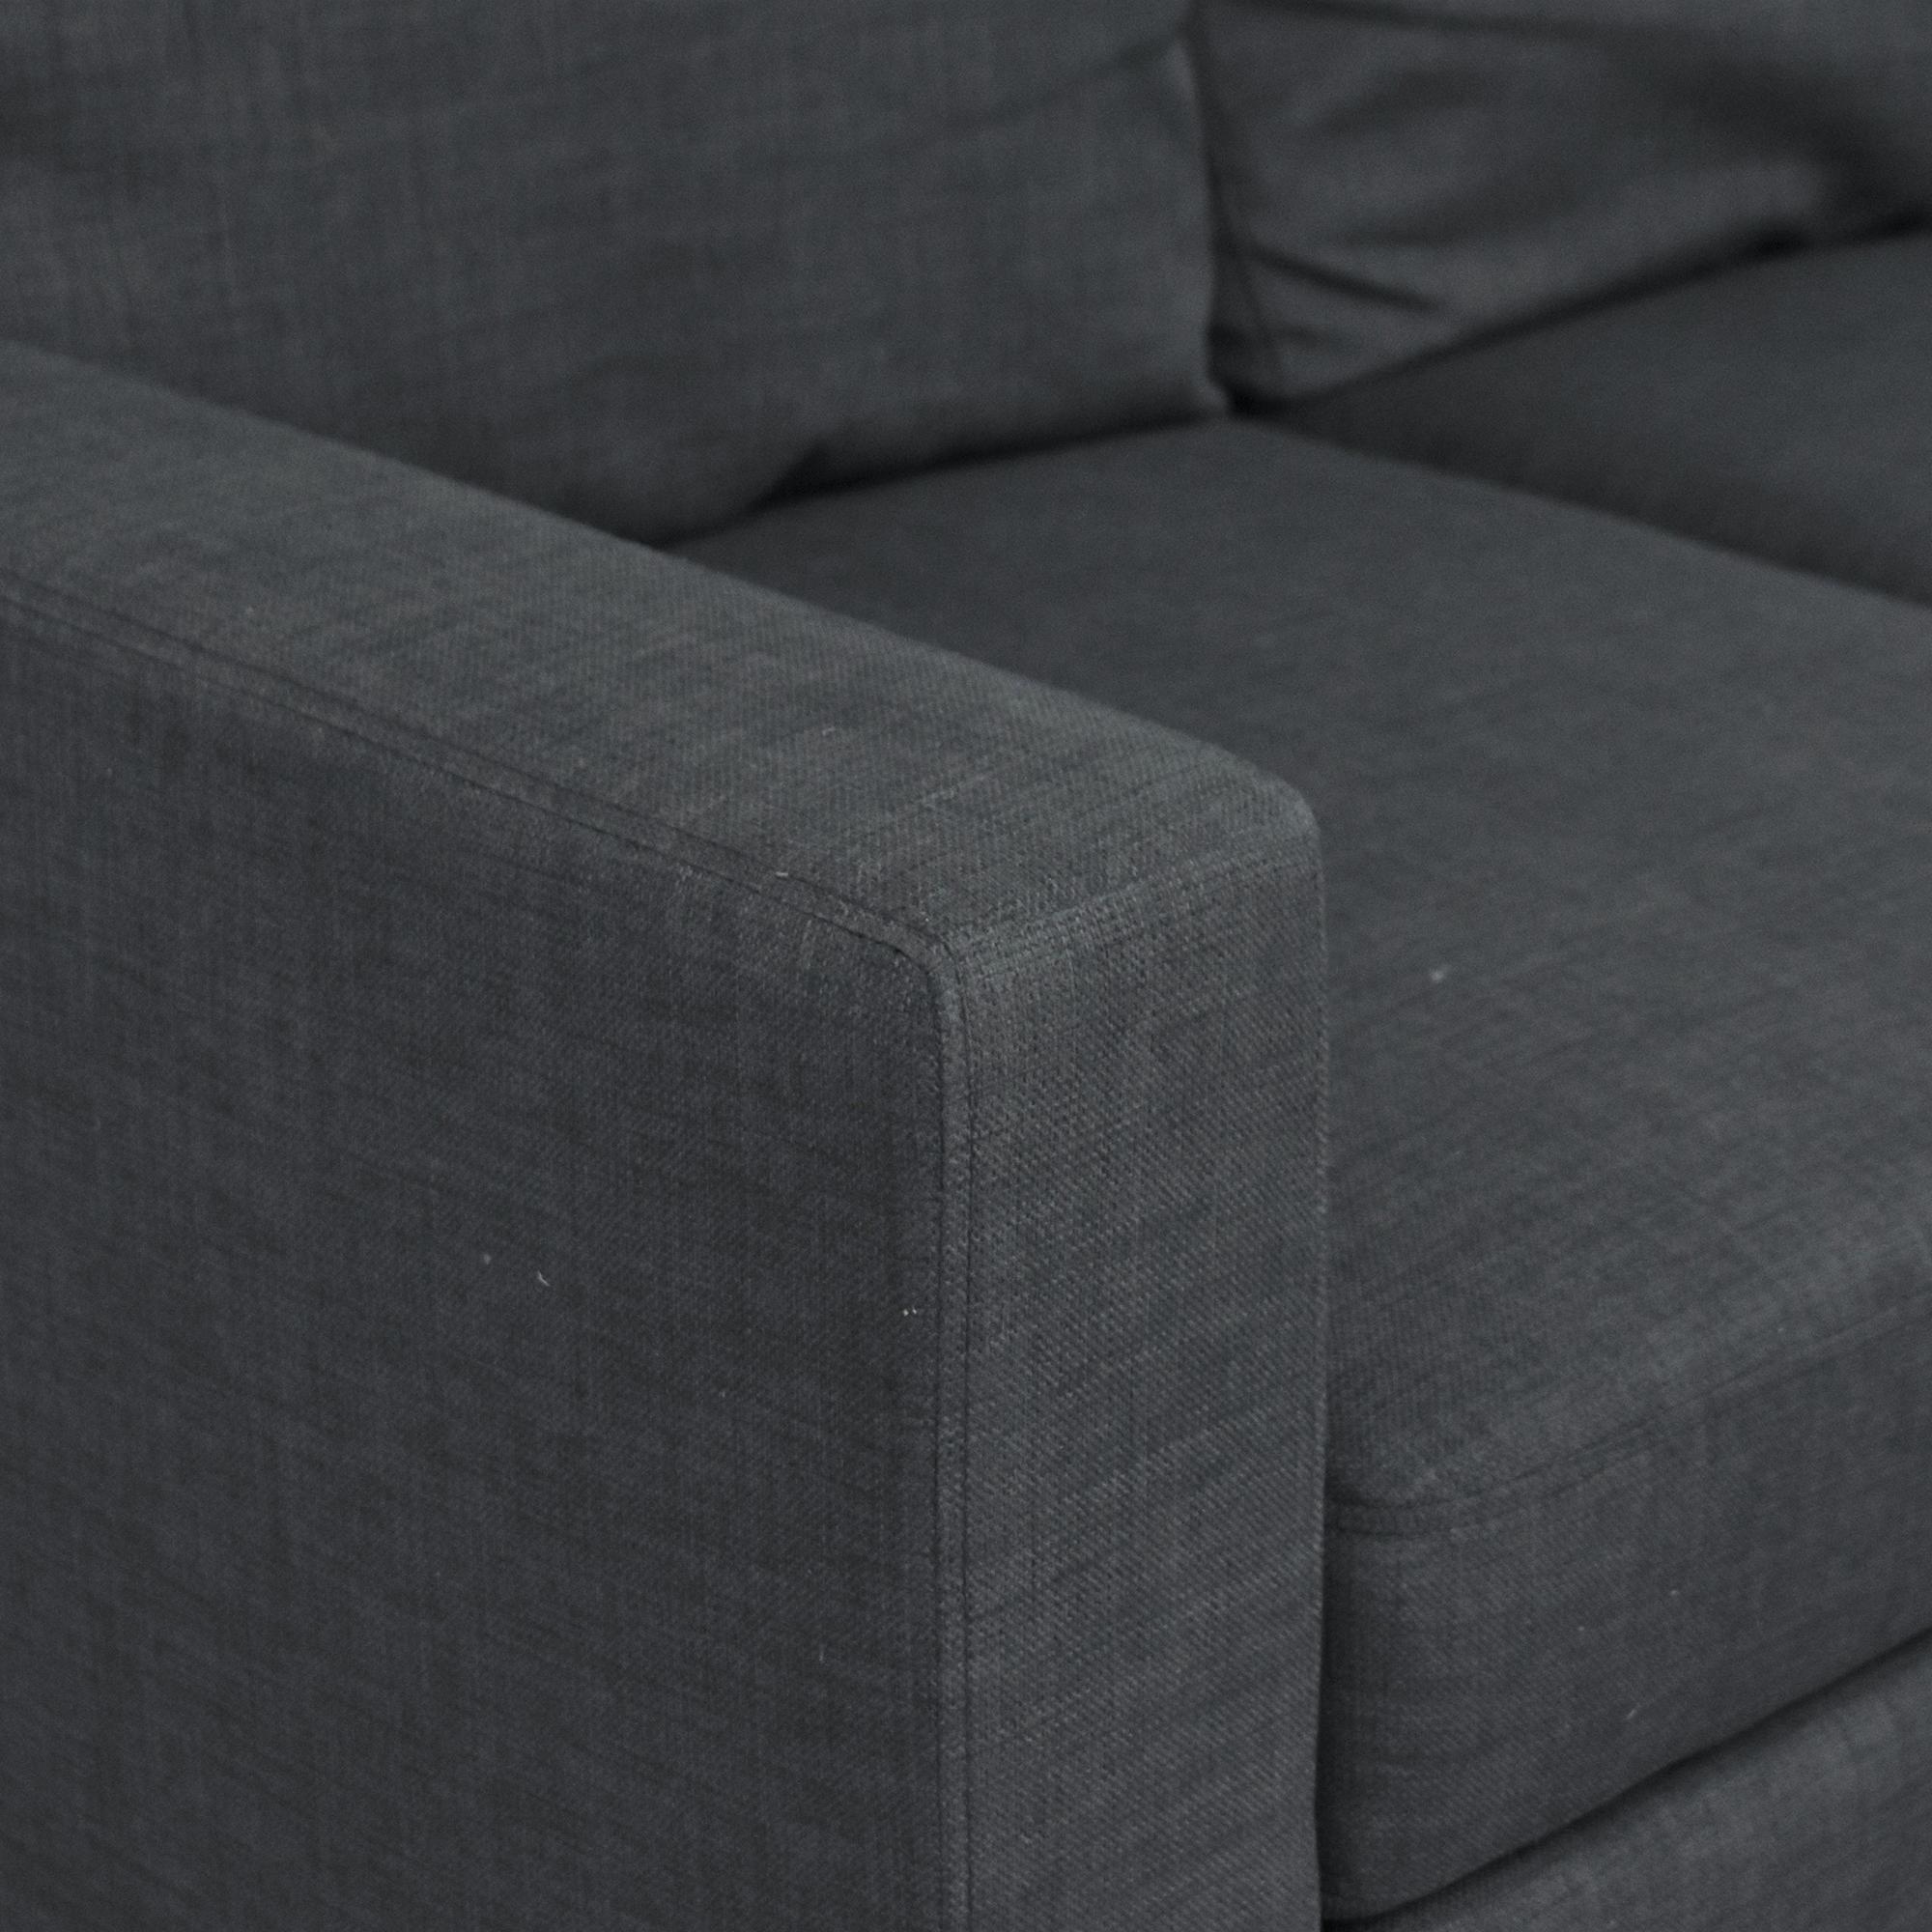 Target Newman Sleeper Sectional Sofa sale